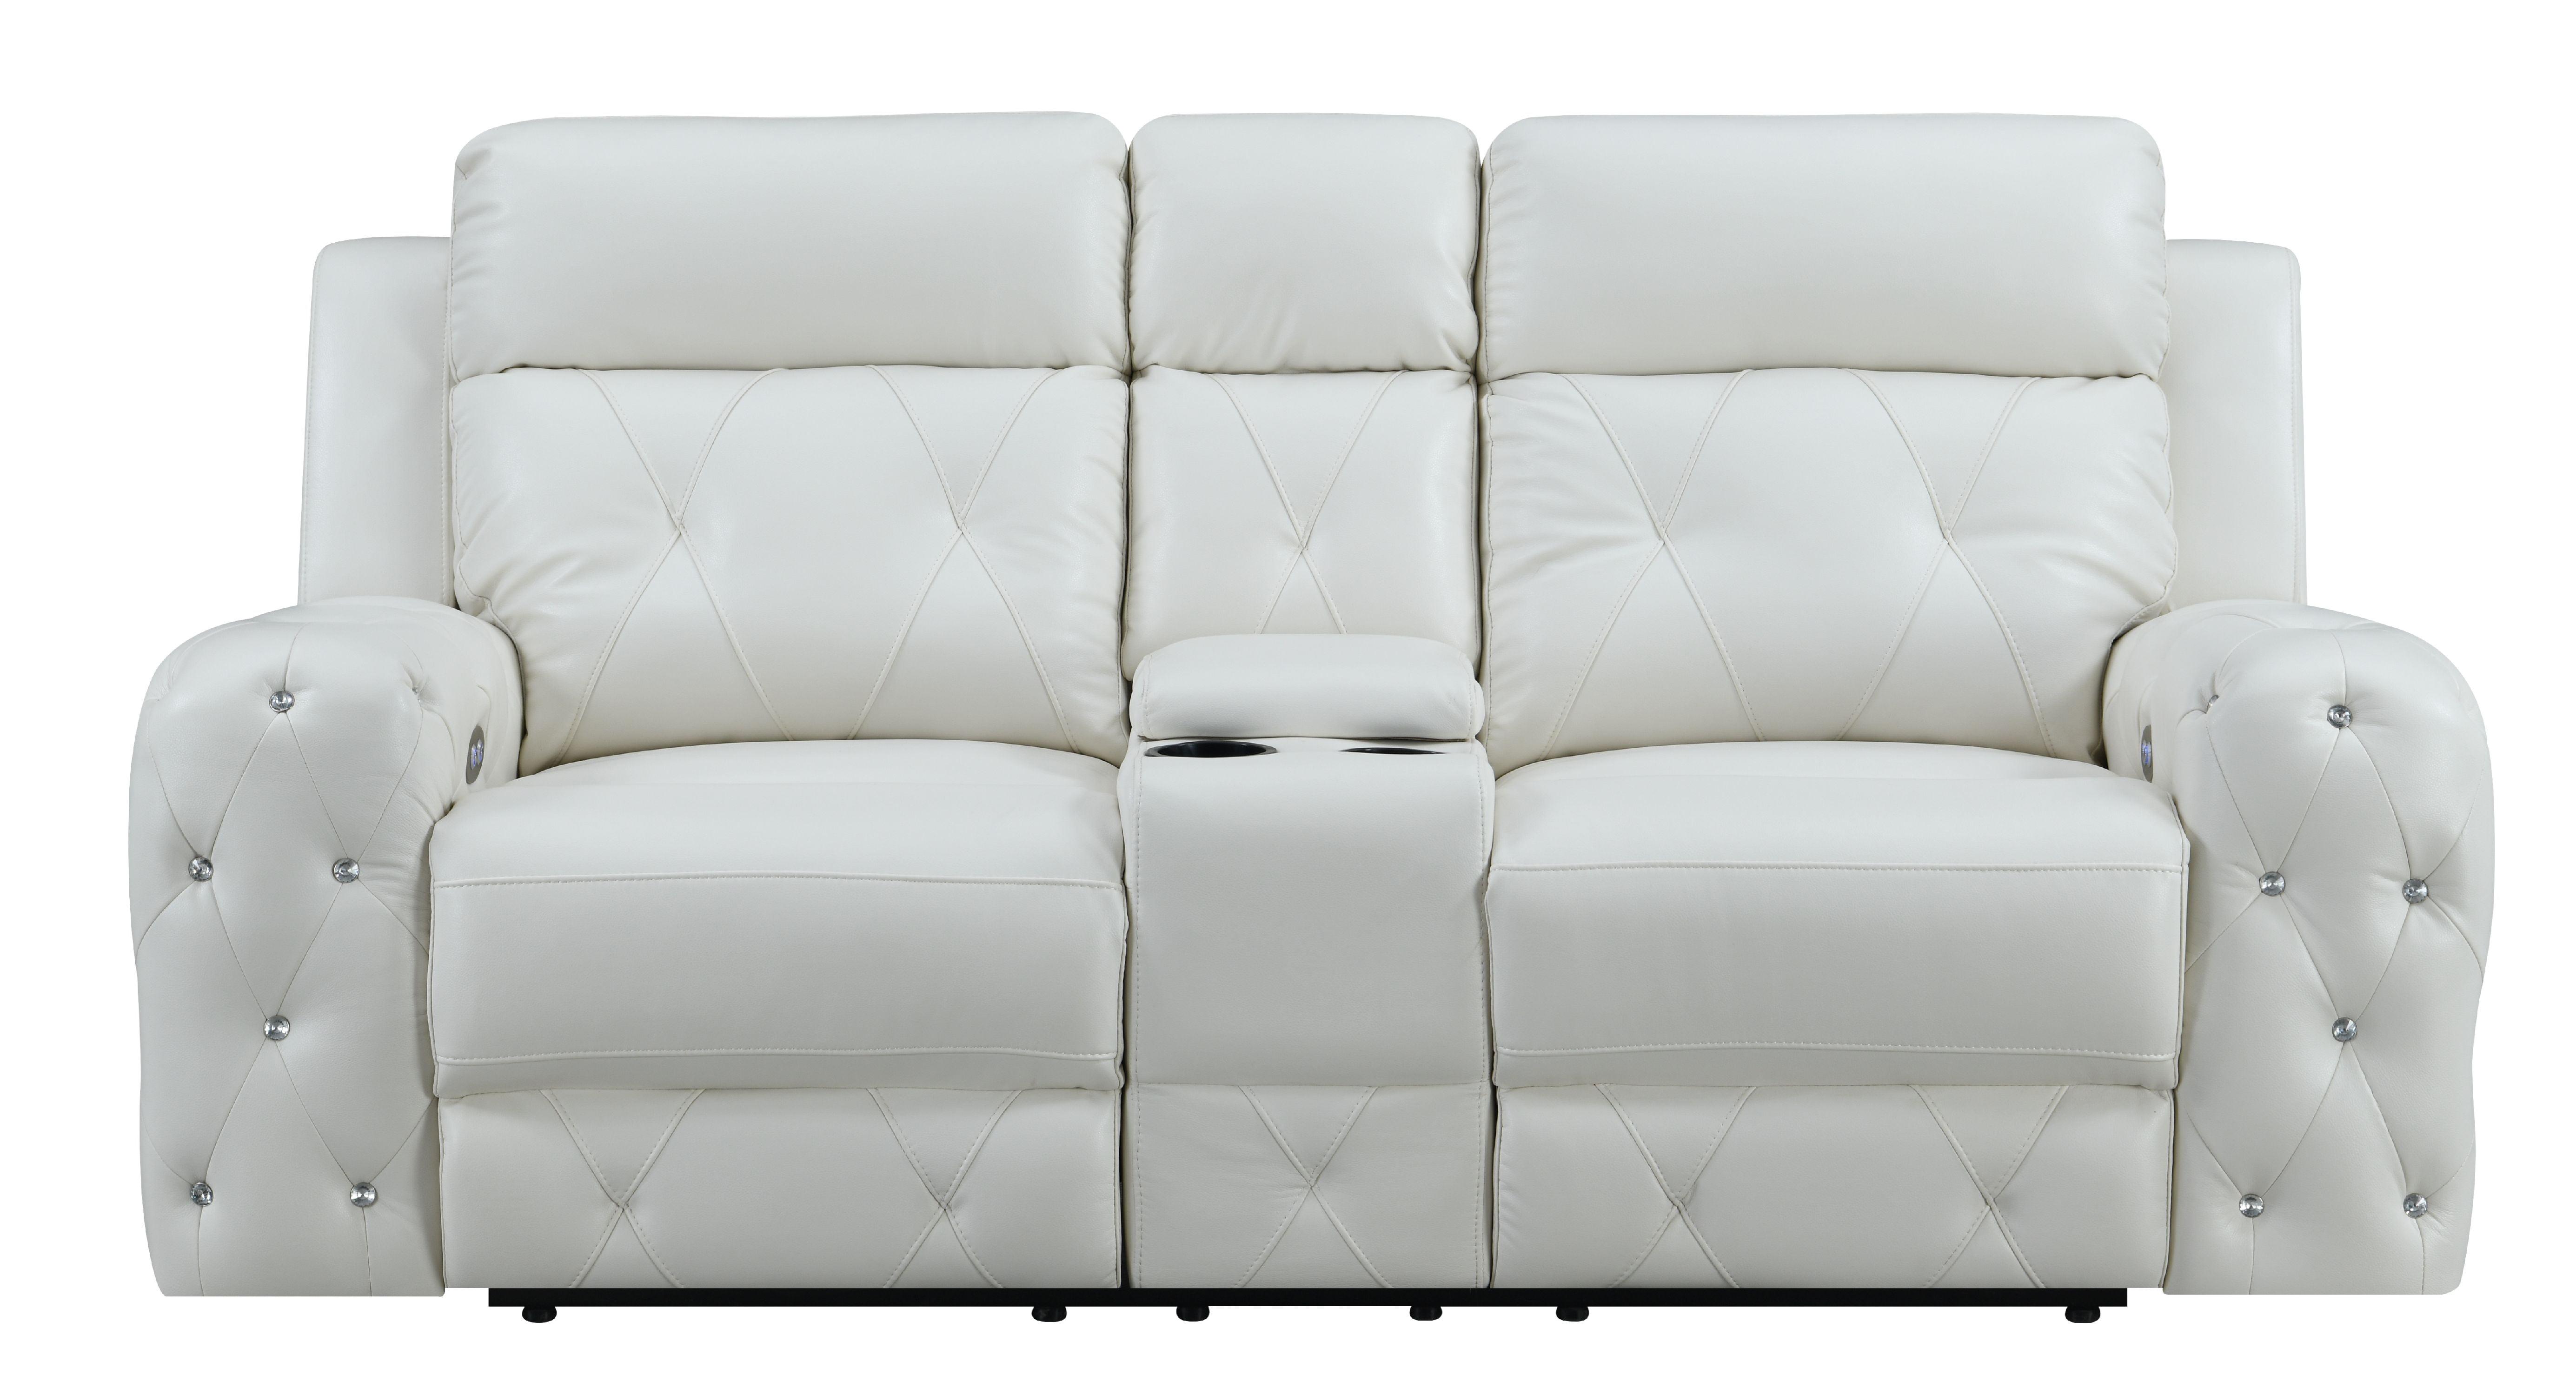 Fantastic Global Furniture Usa Jewel Embellished White Power Console Recline Loveseat Walmart Com Creativecarmelina Interior Chair Design Creativecarmelinacom